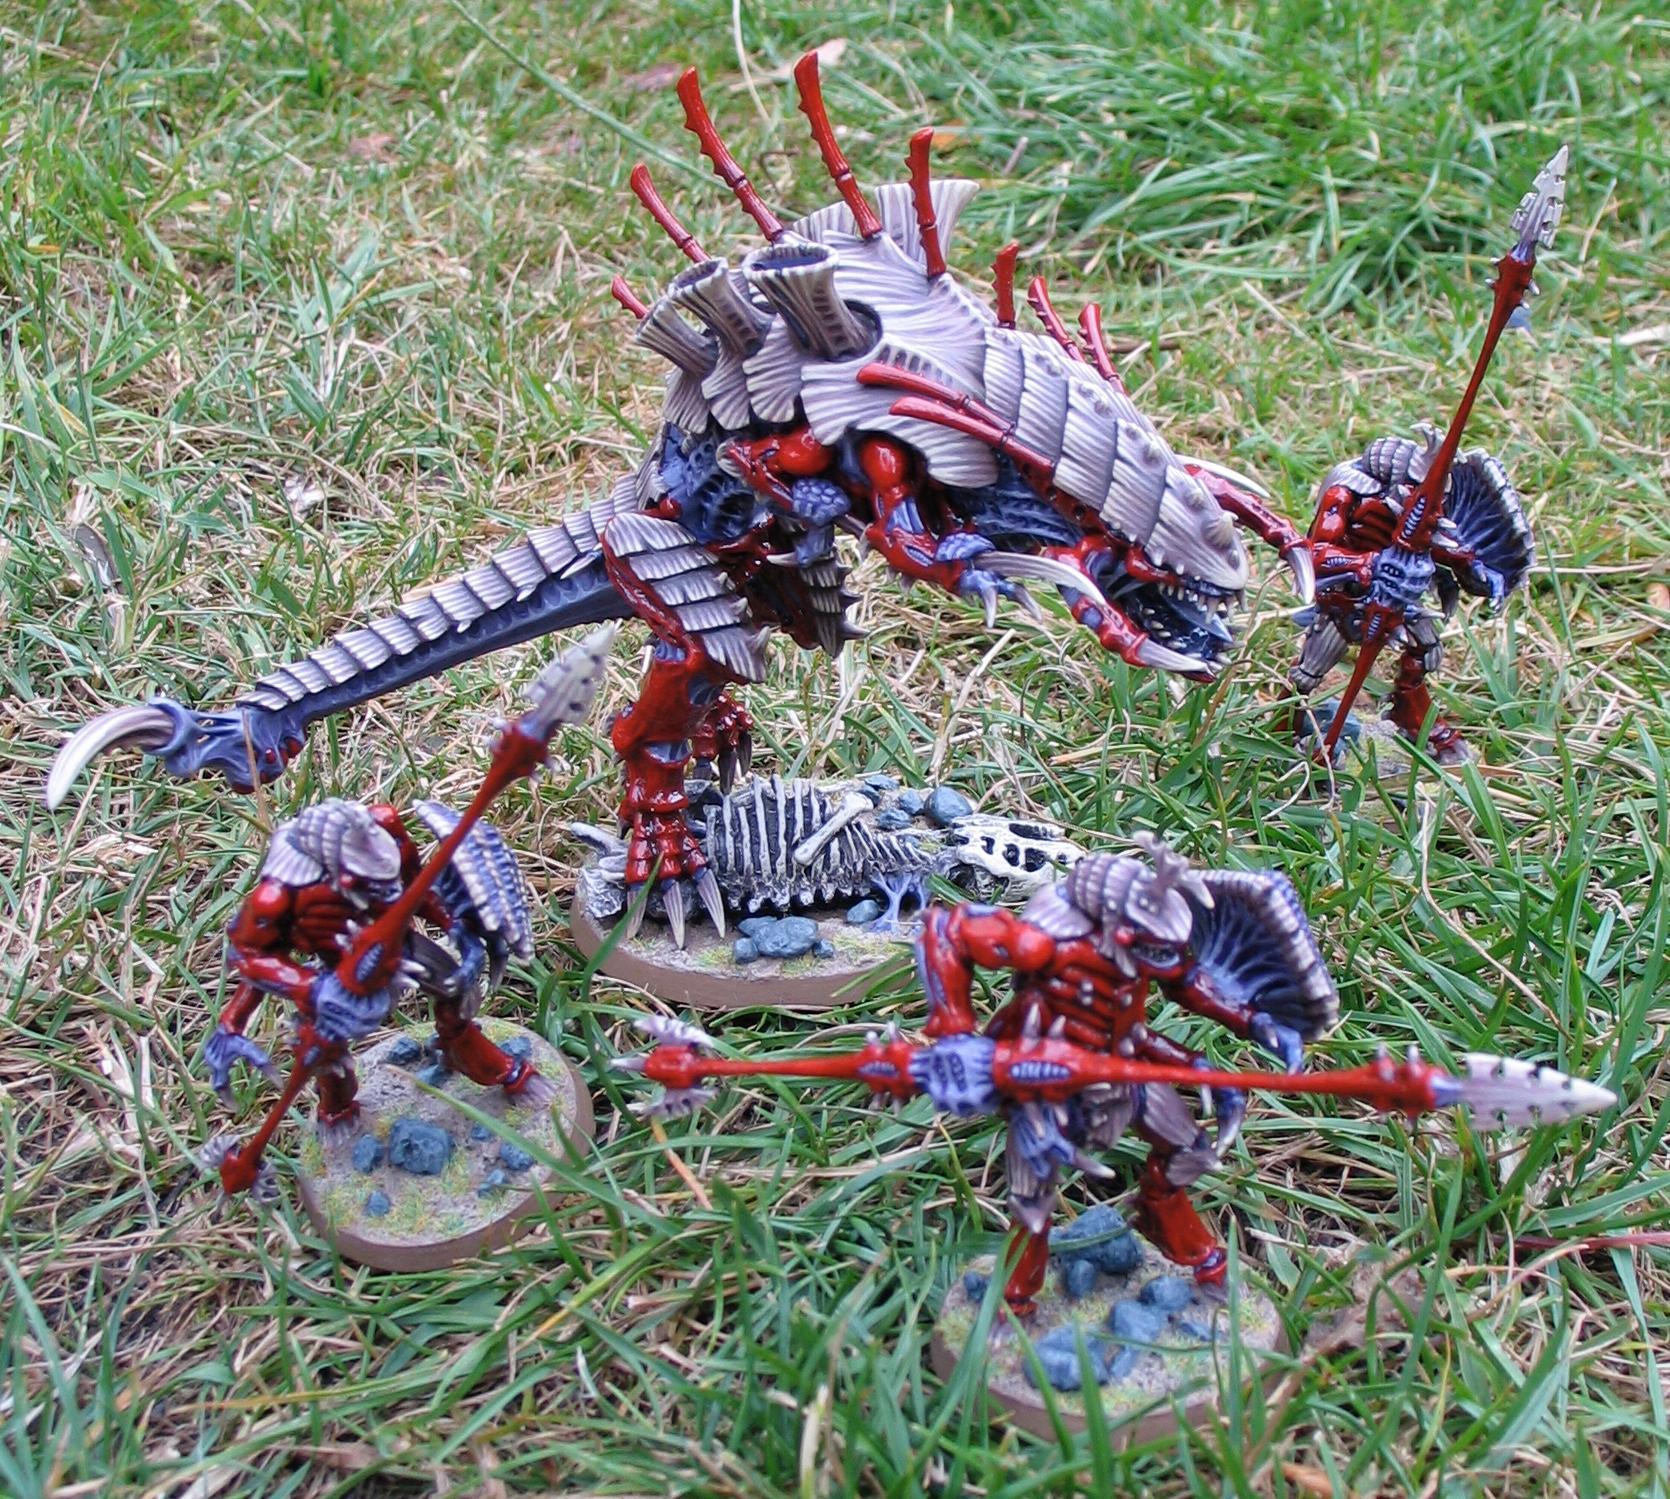 Behemoth, Hive Tyrant, Swarmlord, Tyranids, Tyrant Guard